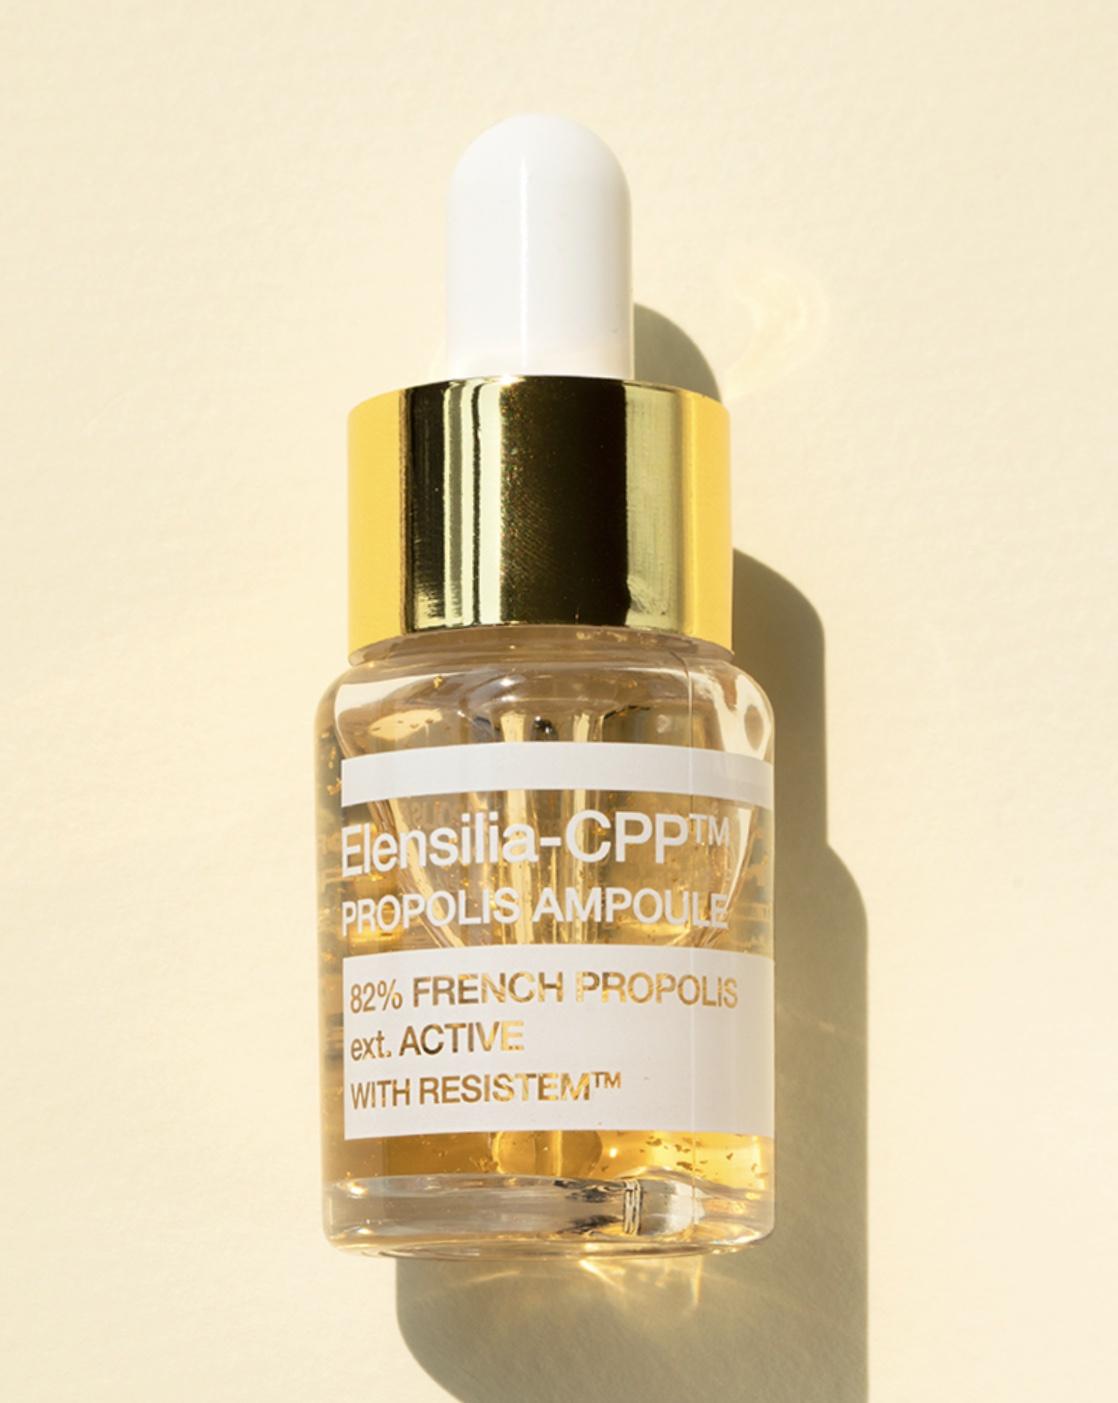 ELENSILIA Cpp French Propolis 82% Resistem Ampoule